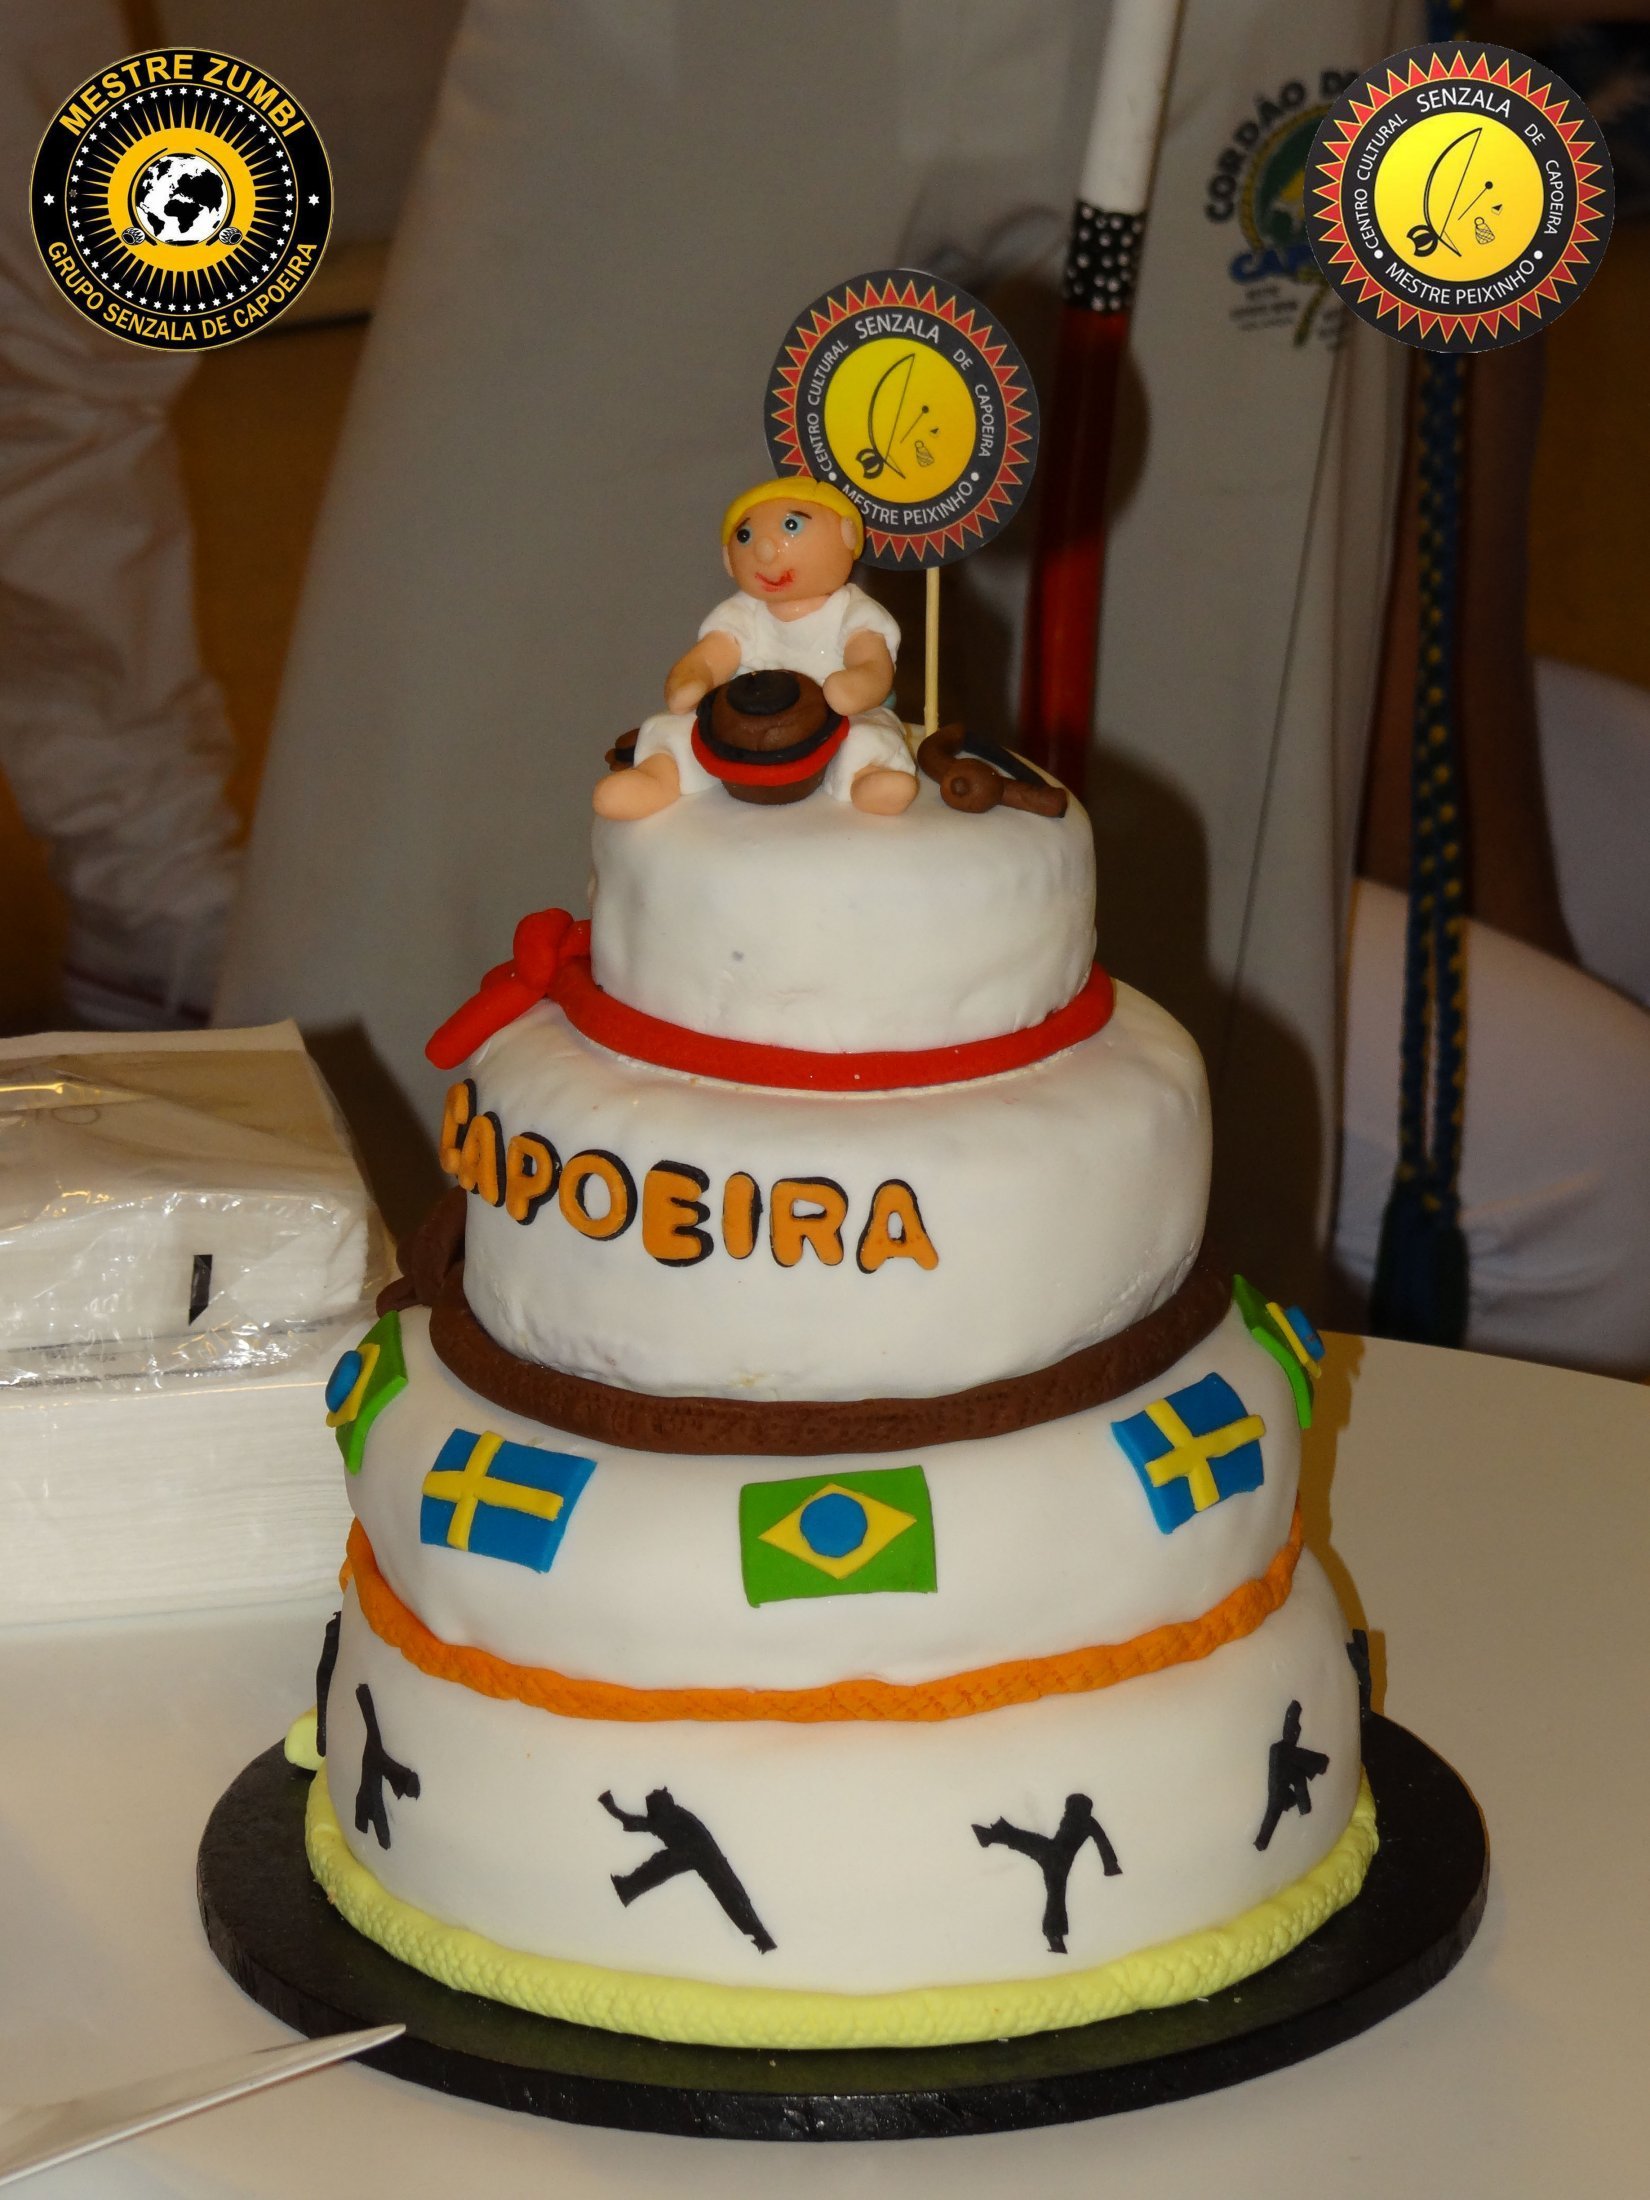 2013-12-14 - Capoeira 114